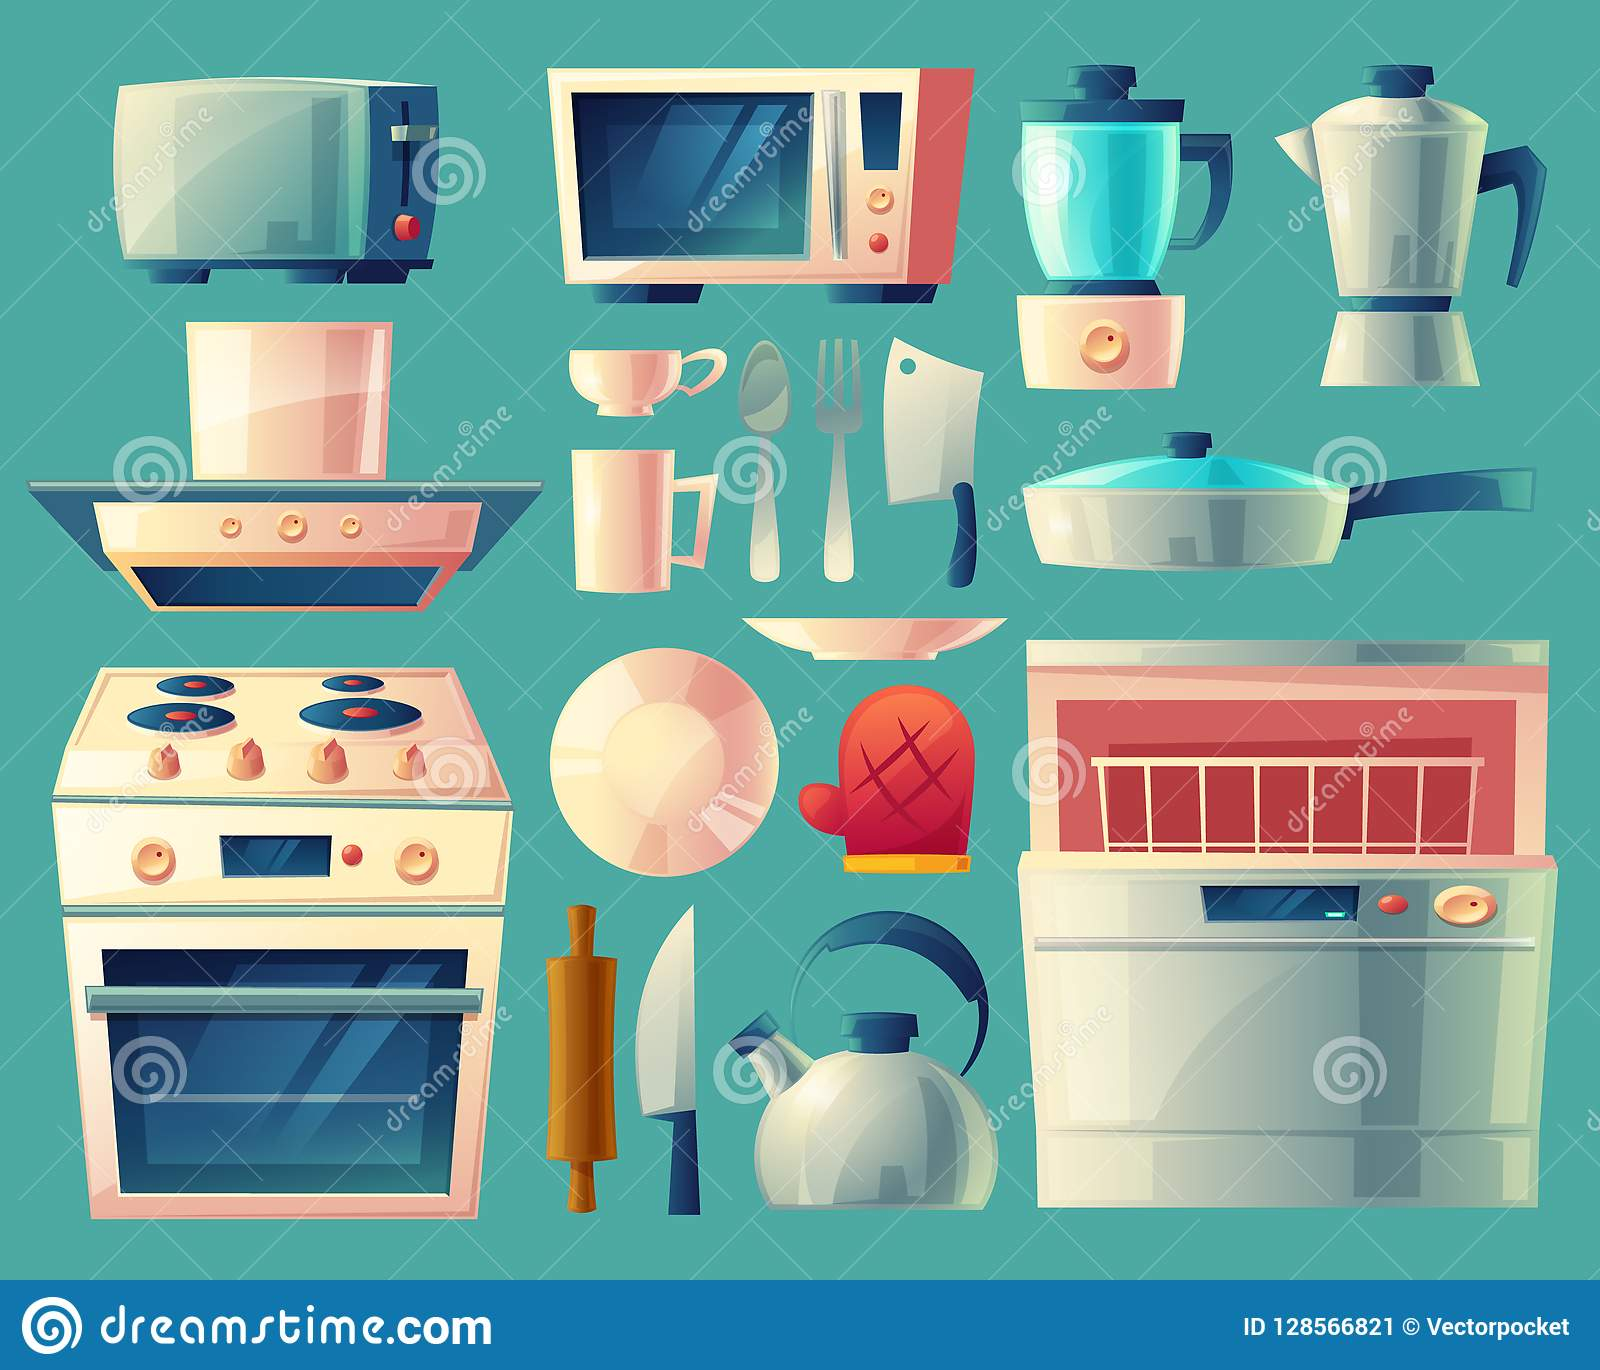 https www dreamstime com cartoon set kitchen appliances washing machine toaster fridge microwave kettle blender stove exhaust hood pan cup knife image128566821